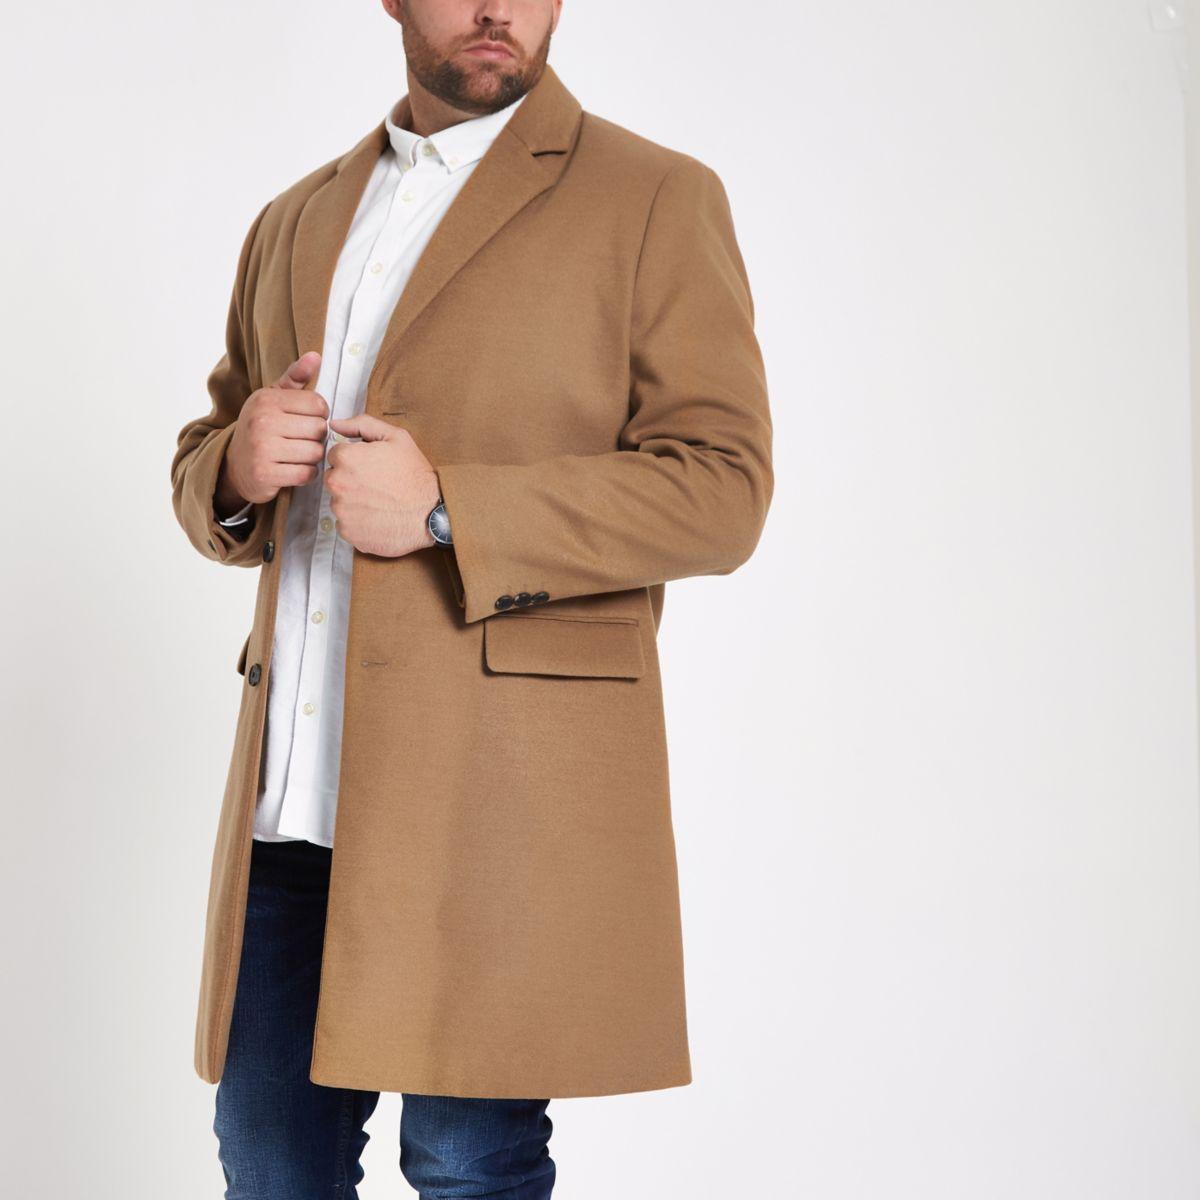 Big & Tall – Geknöpfter, klassischer Mantel in Camel